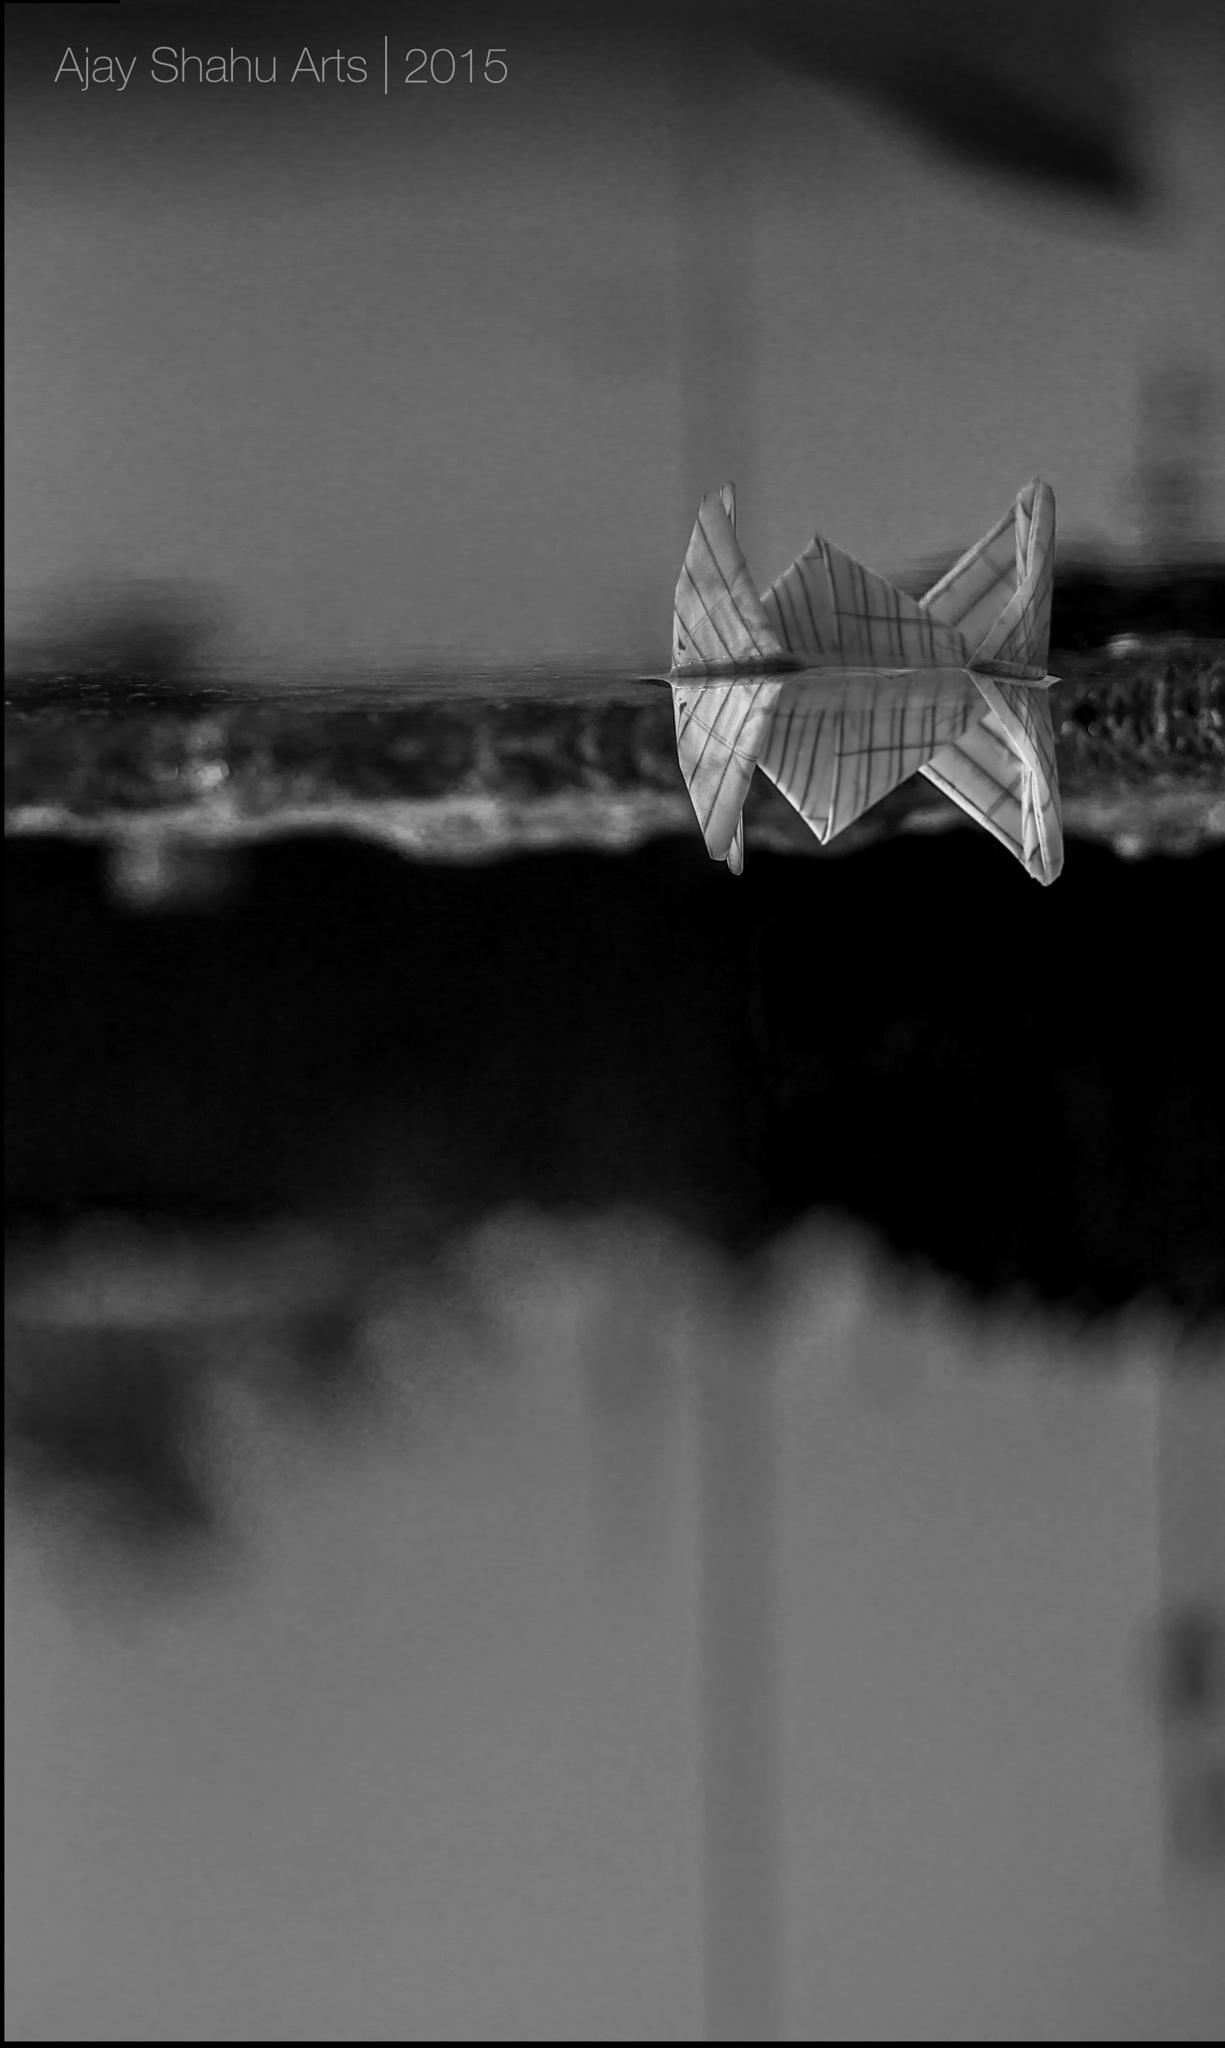 Upside down by Ajay Shahu